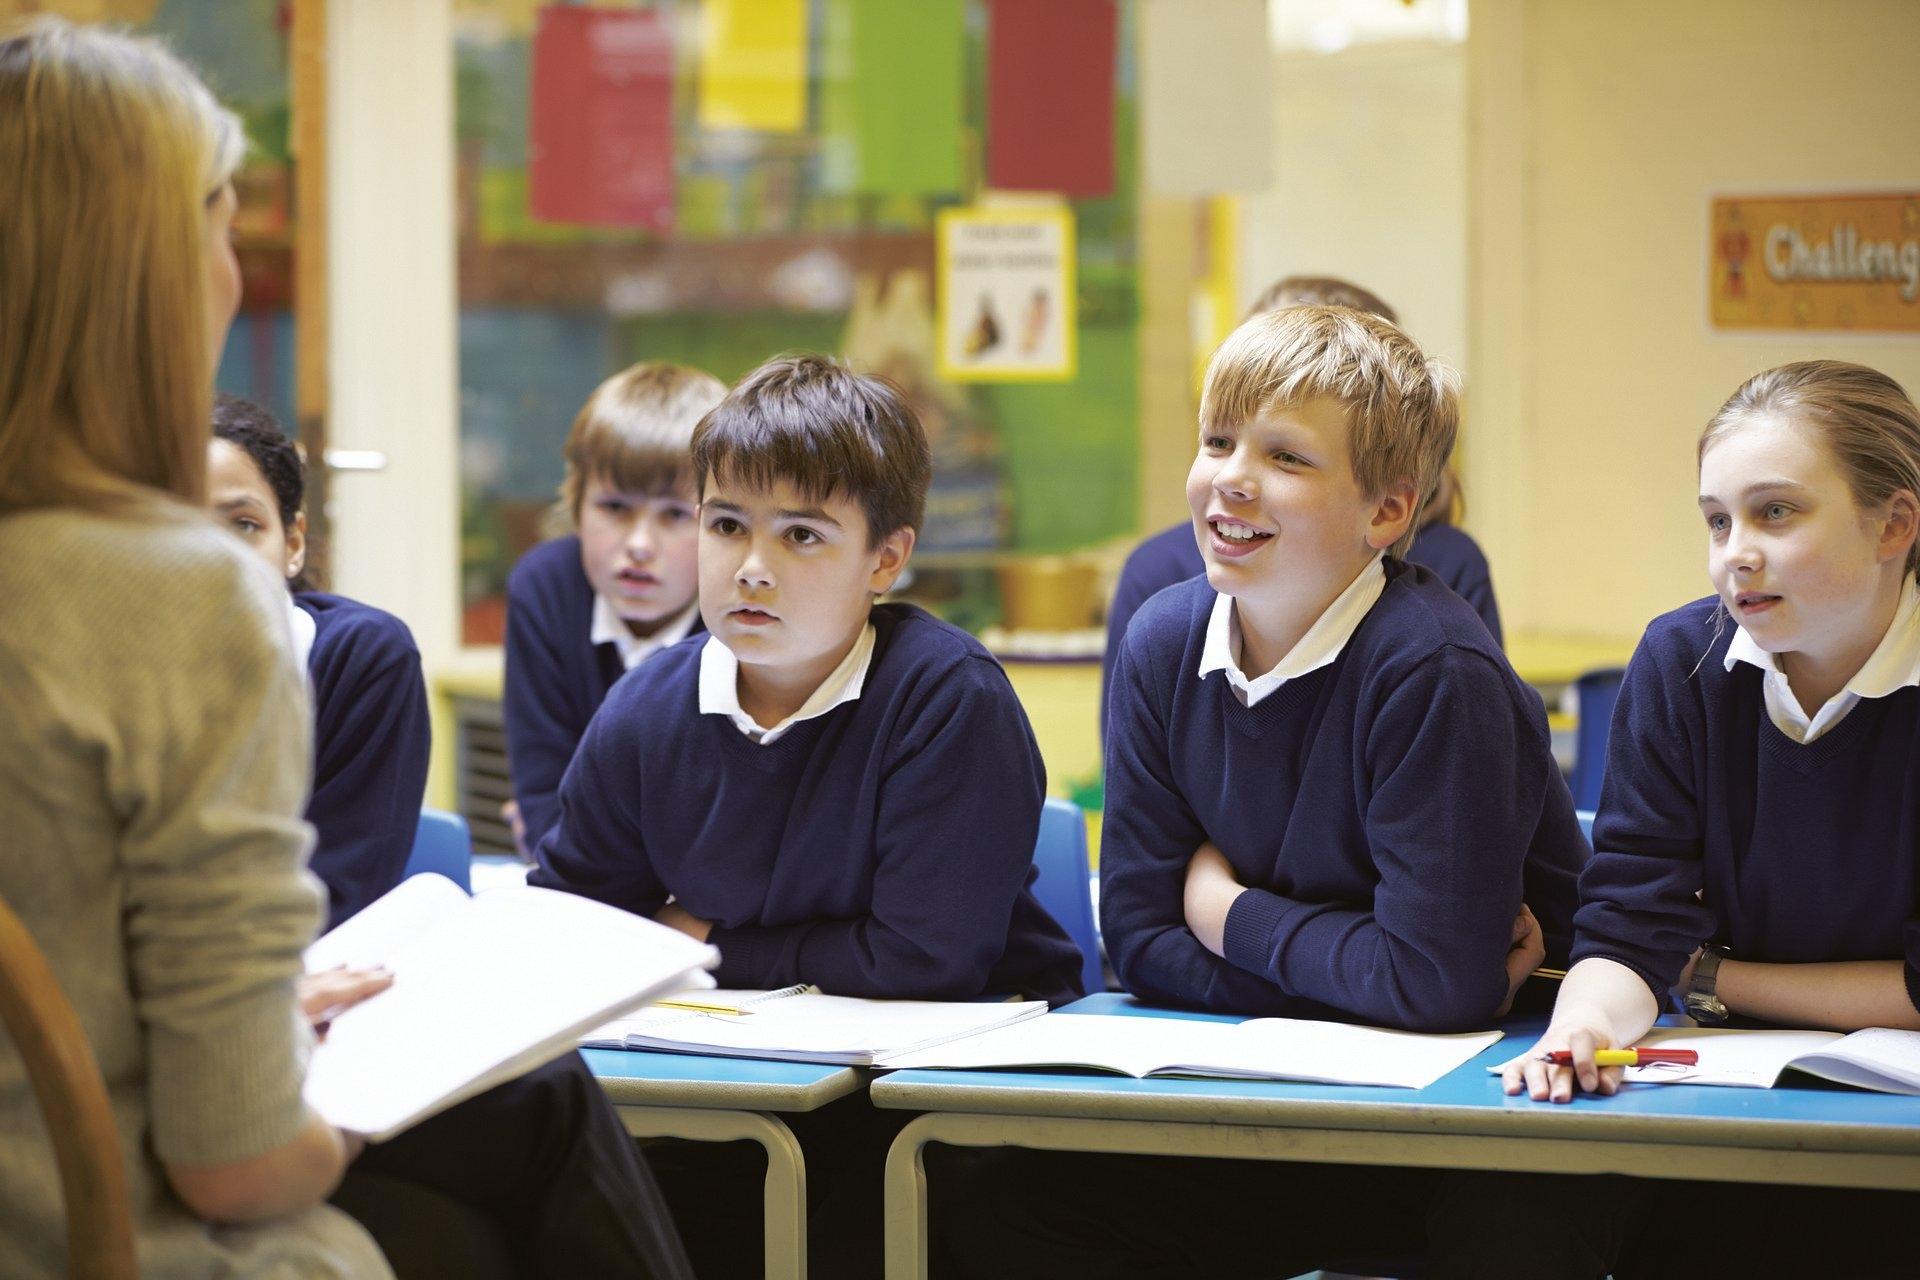 Three inspirational ideas for writing sensational school-set stories